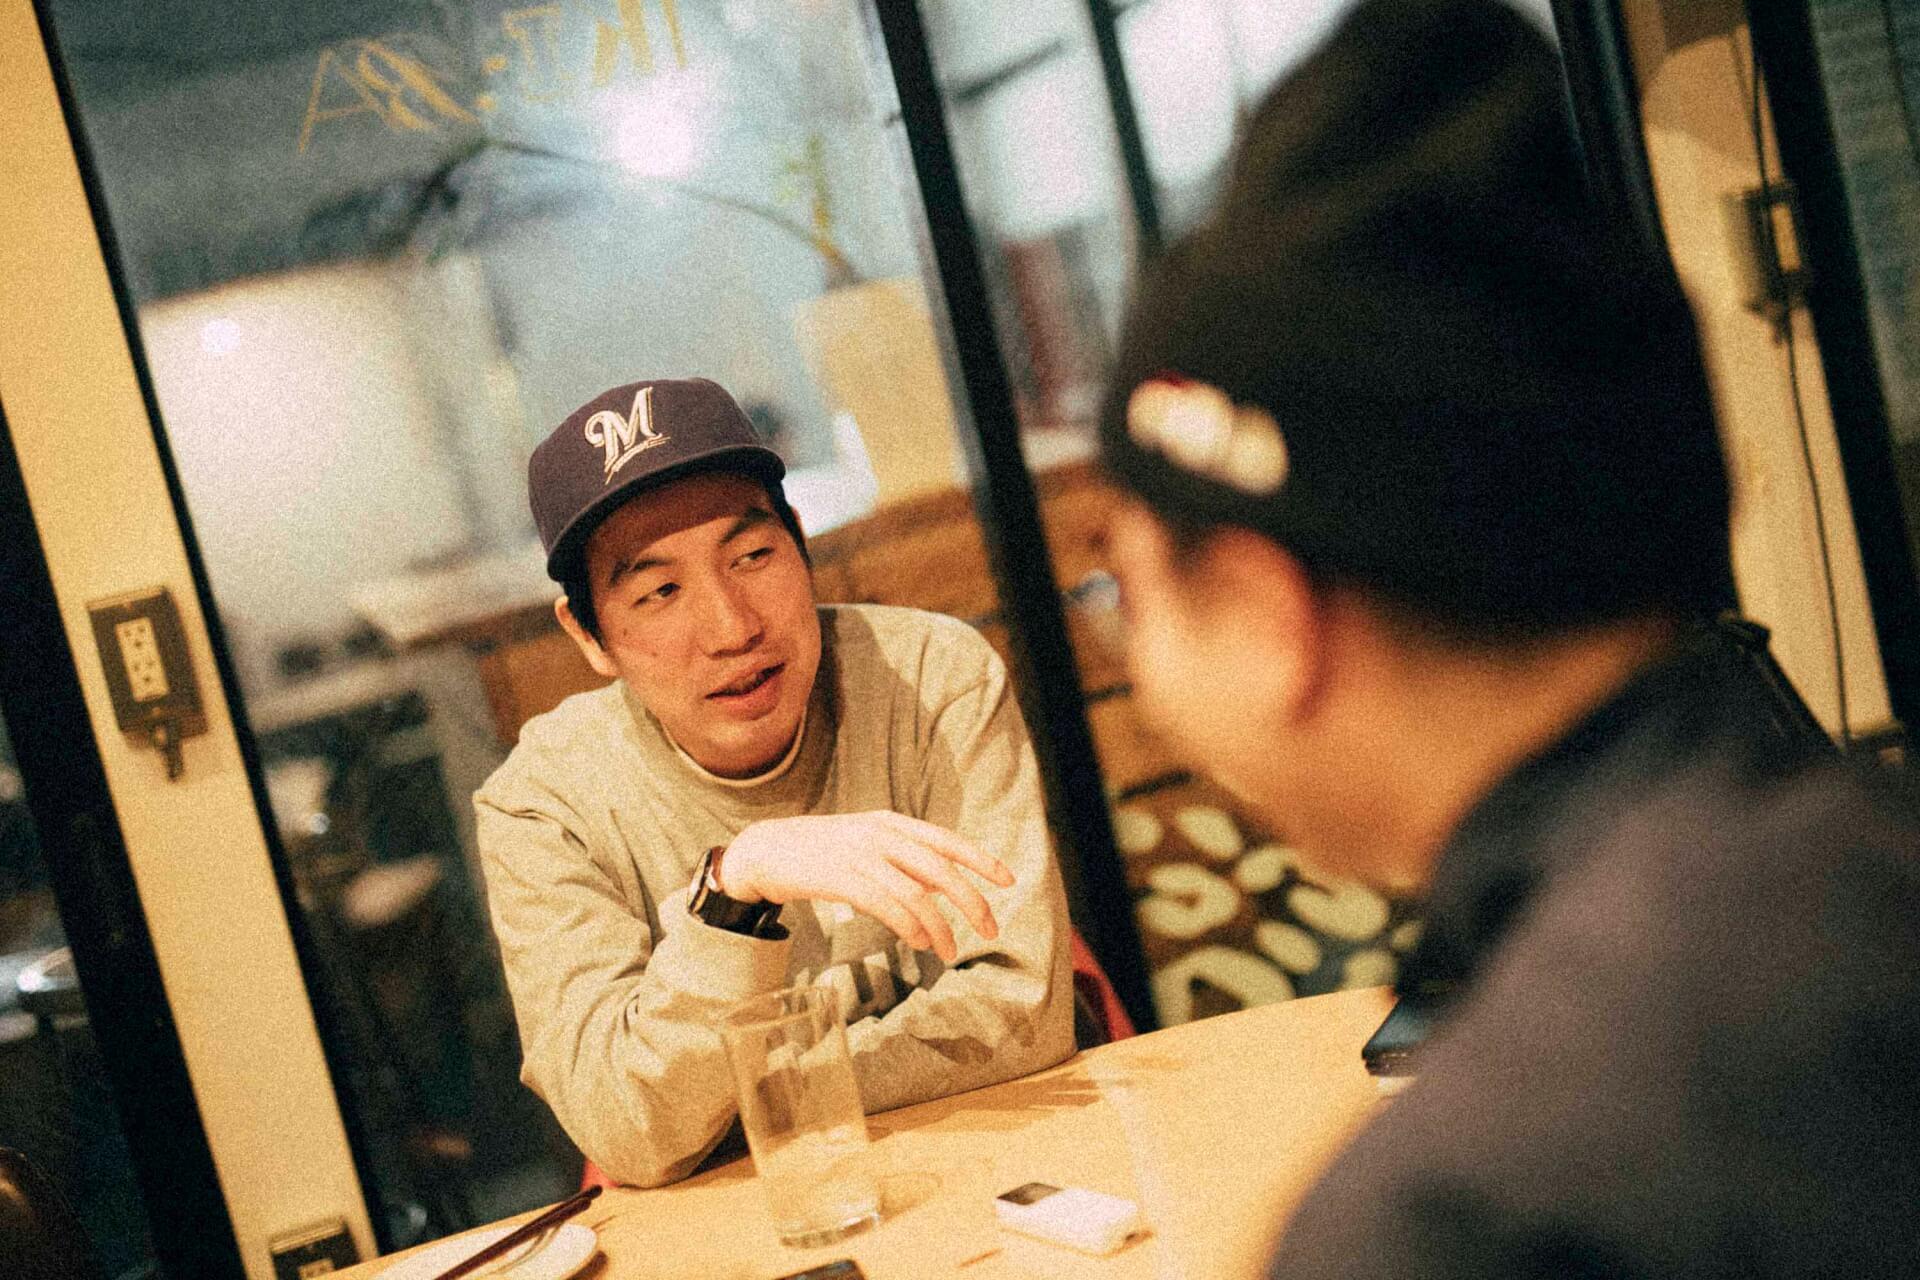 "So I'm Your Friend ―― 原島""ど真ん中""宙芳、インタヴュー interview1903-harashima-michiyoshi-10"